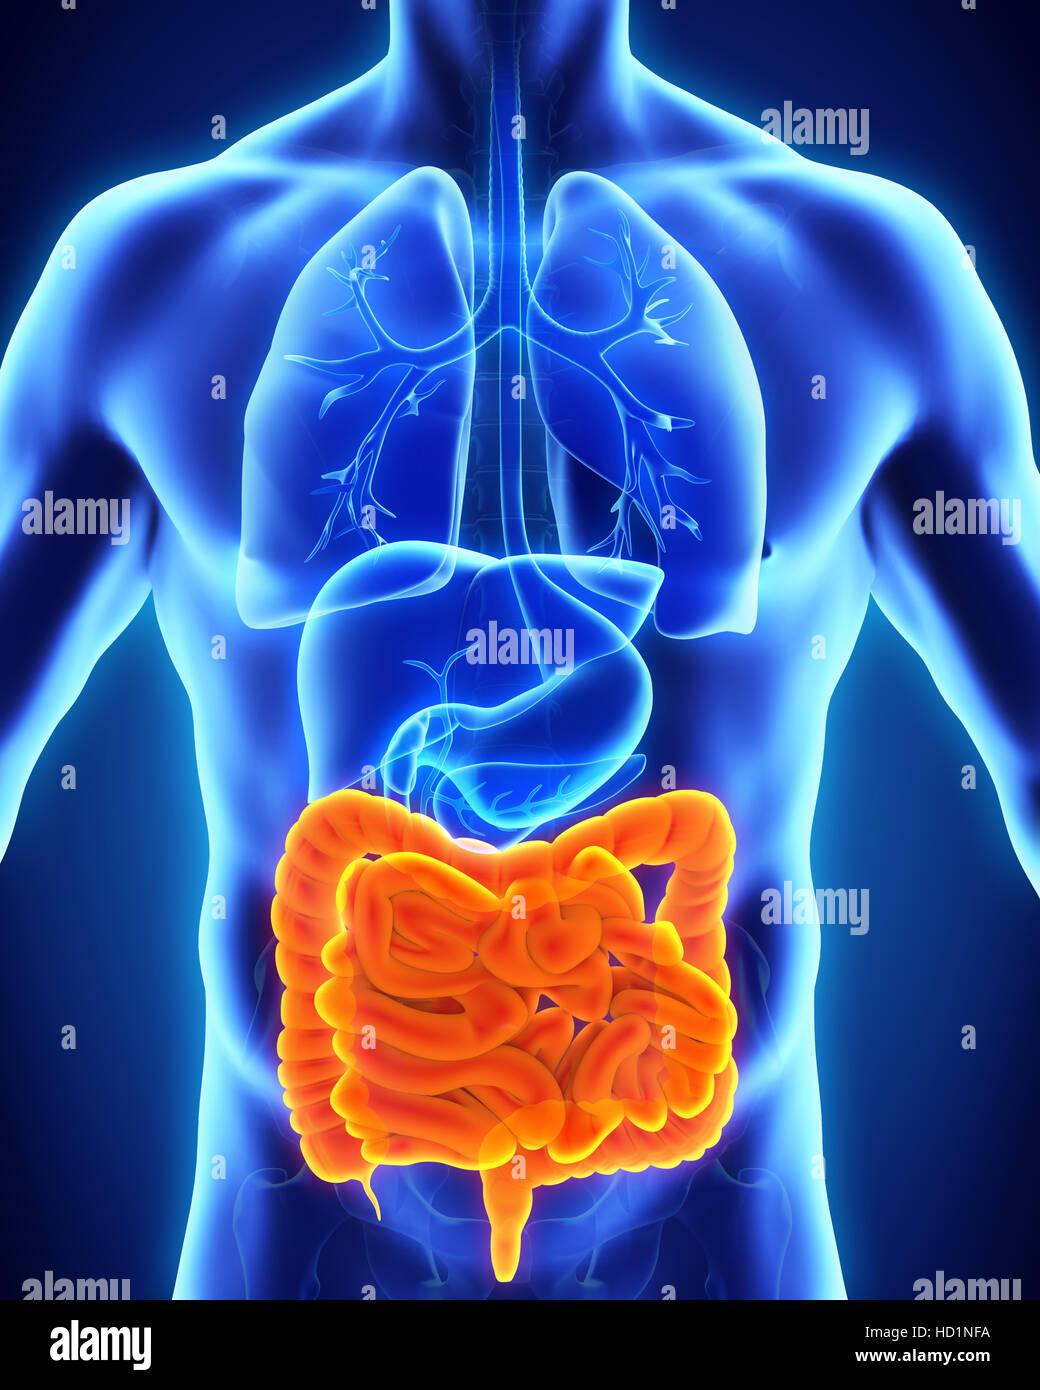 Human intestines anatomy